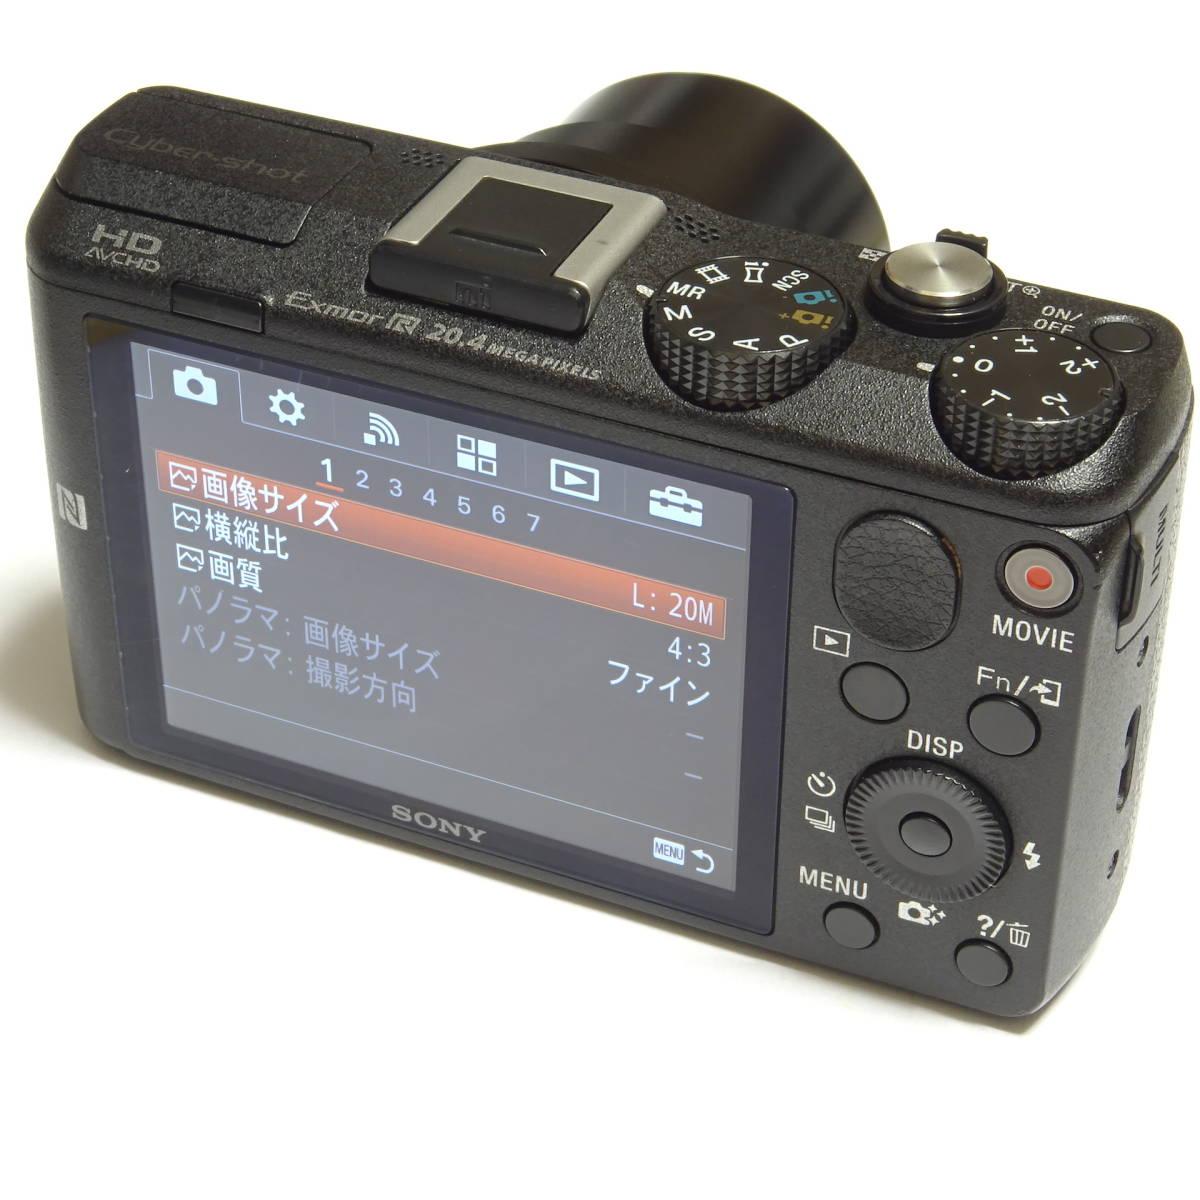 SONY Cyber-shot DSC-HX60V 2040万画素 光学30倍 Full HD 1080 60p 動画撮影 GPS Wi-Fi NFC 中古本体・箱・取説付き ☆動作品☆ 0899_画像2